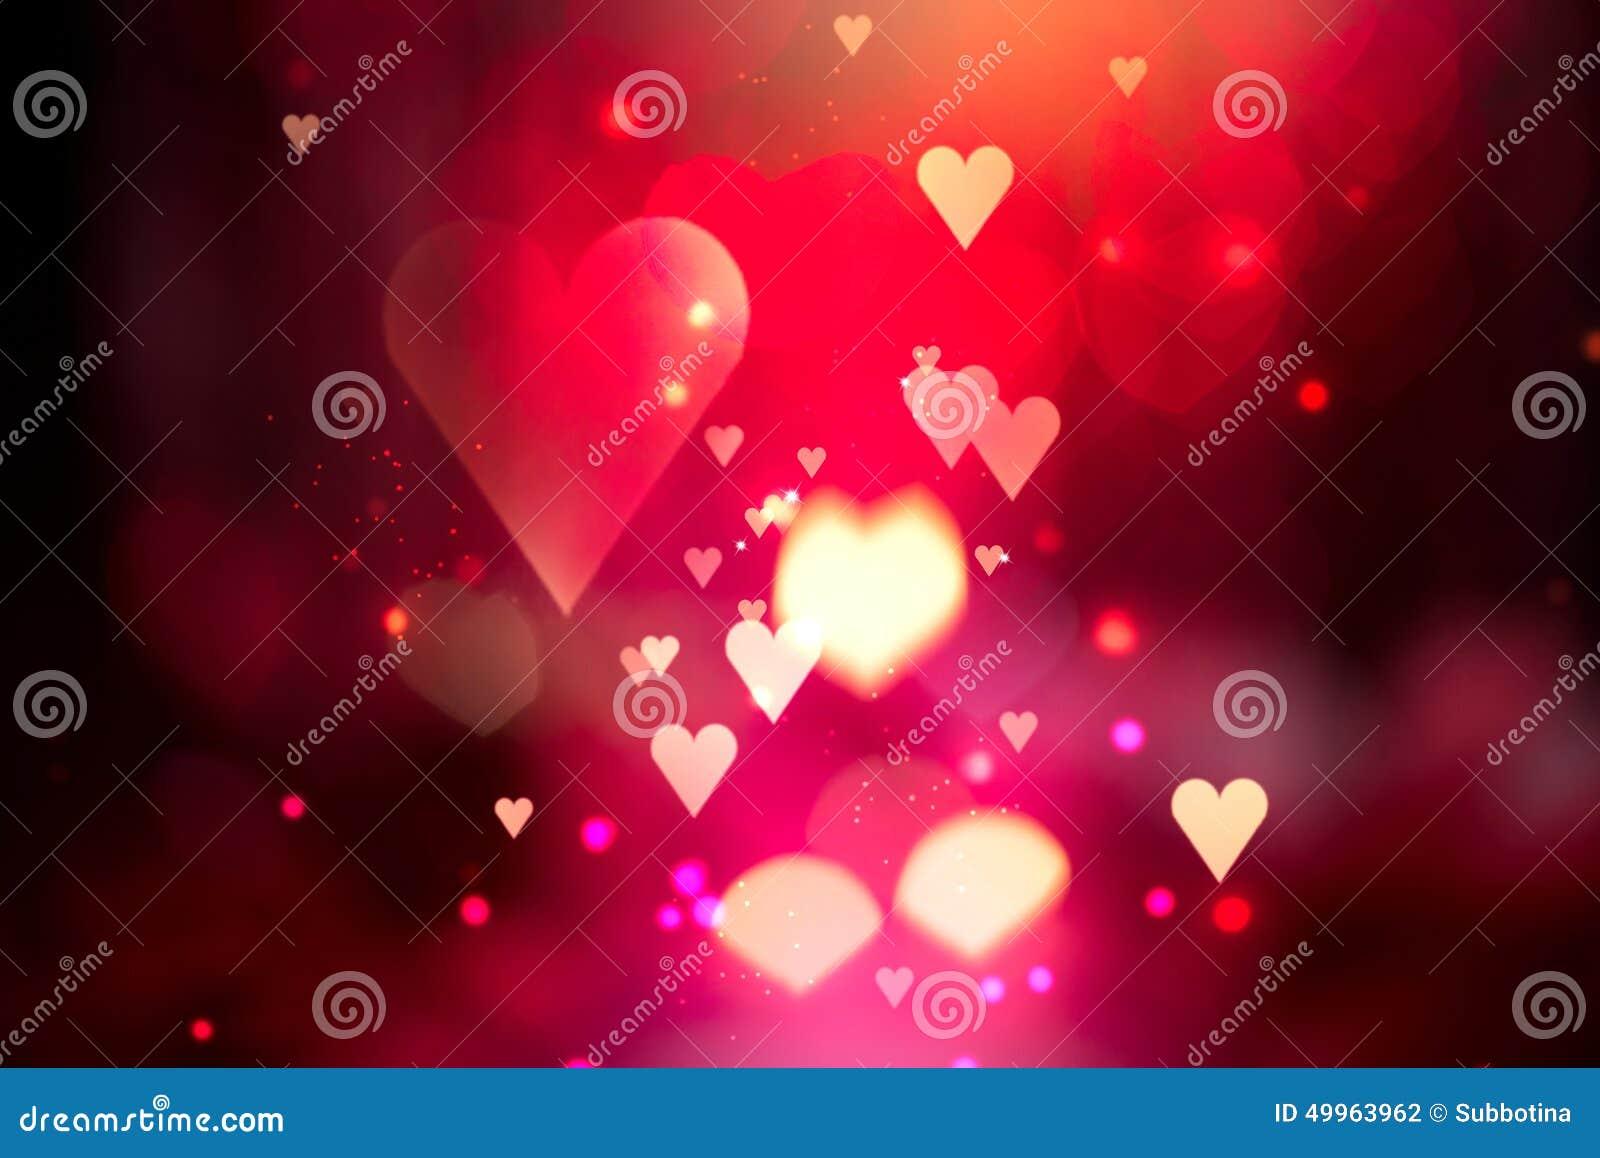 Предпосылка сердец валентинки абстрактная